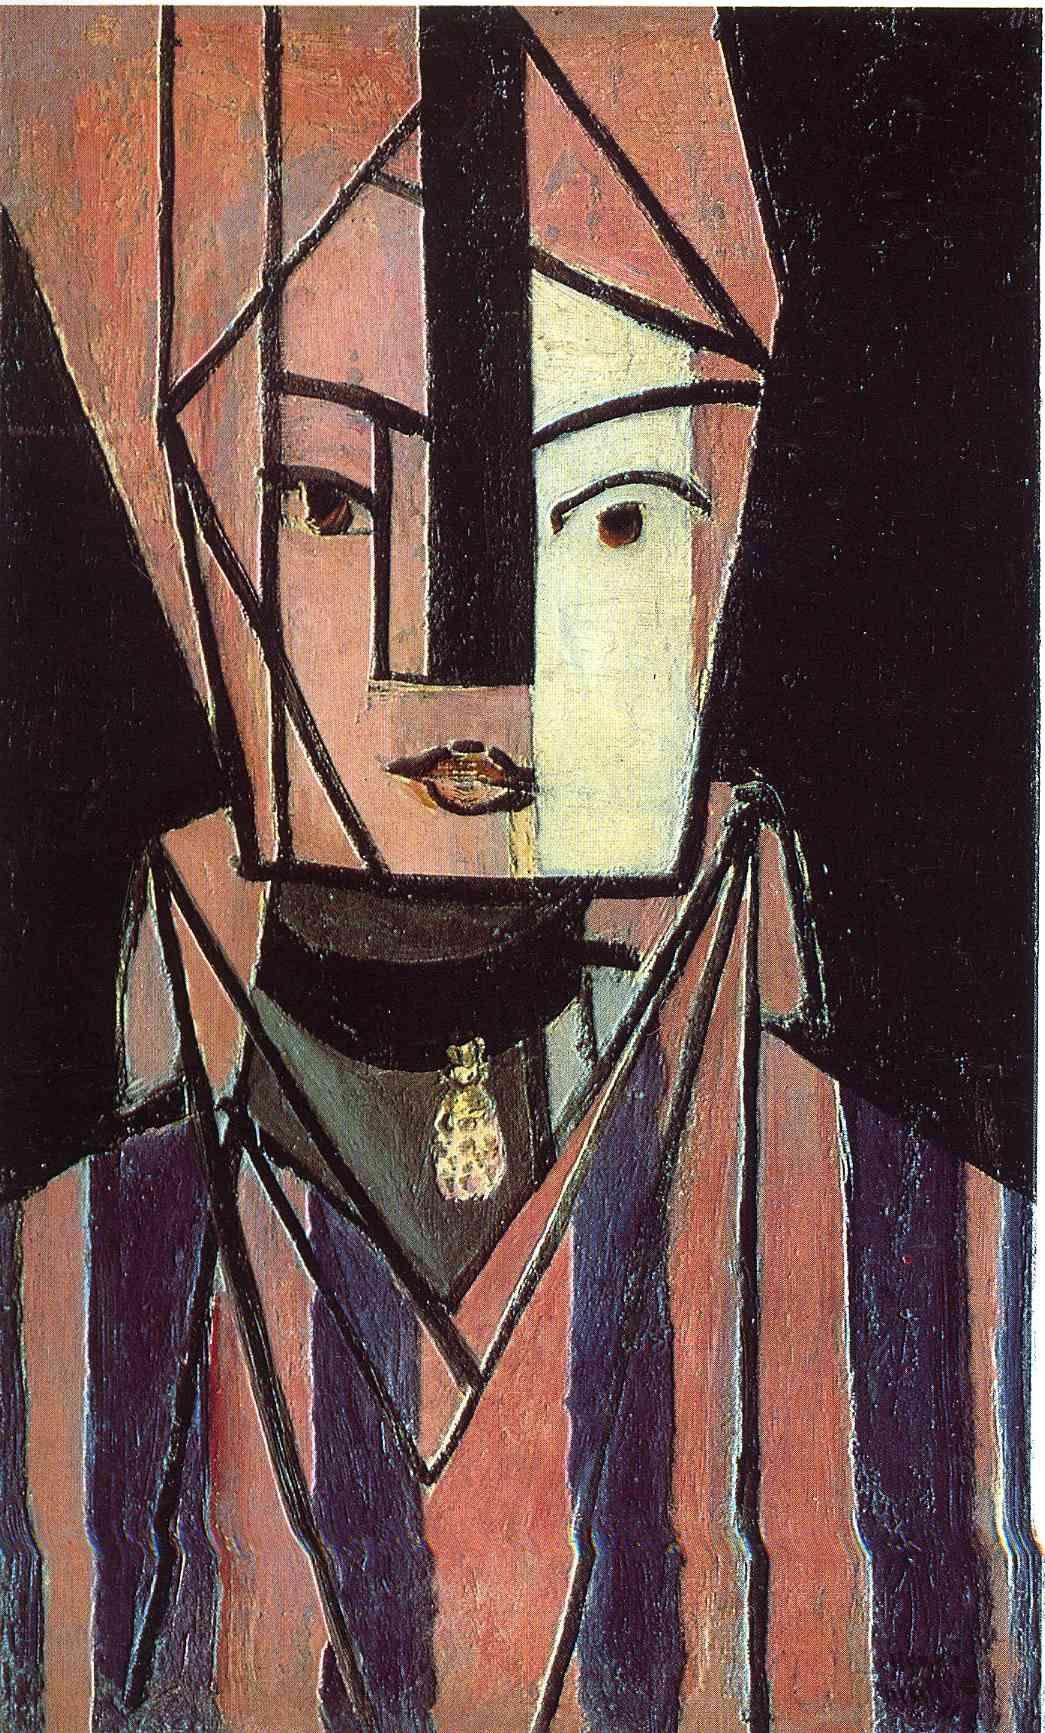 Head white and pink, 1914, oil/canvas, Musée National d'Art Moderne, Centre Georges Pompidou, Paris, France